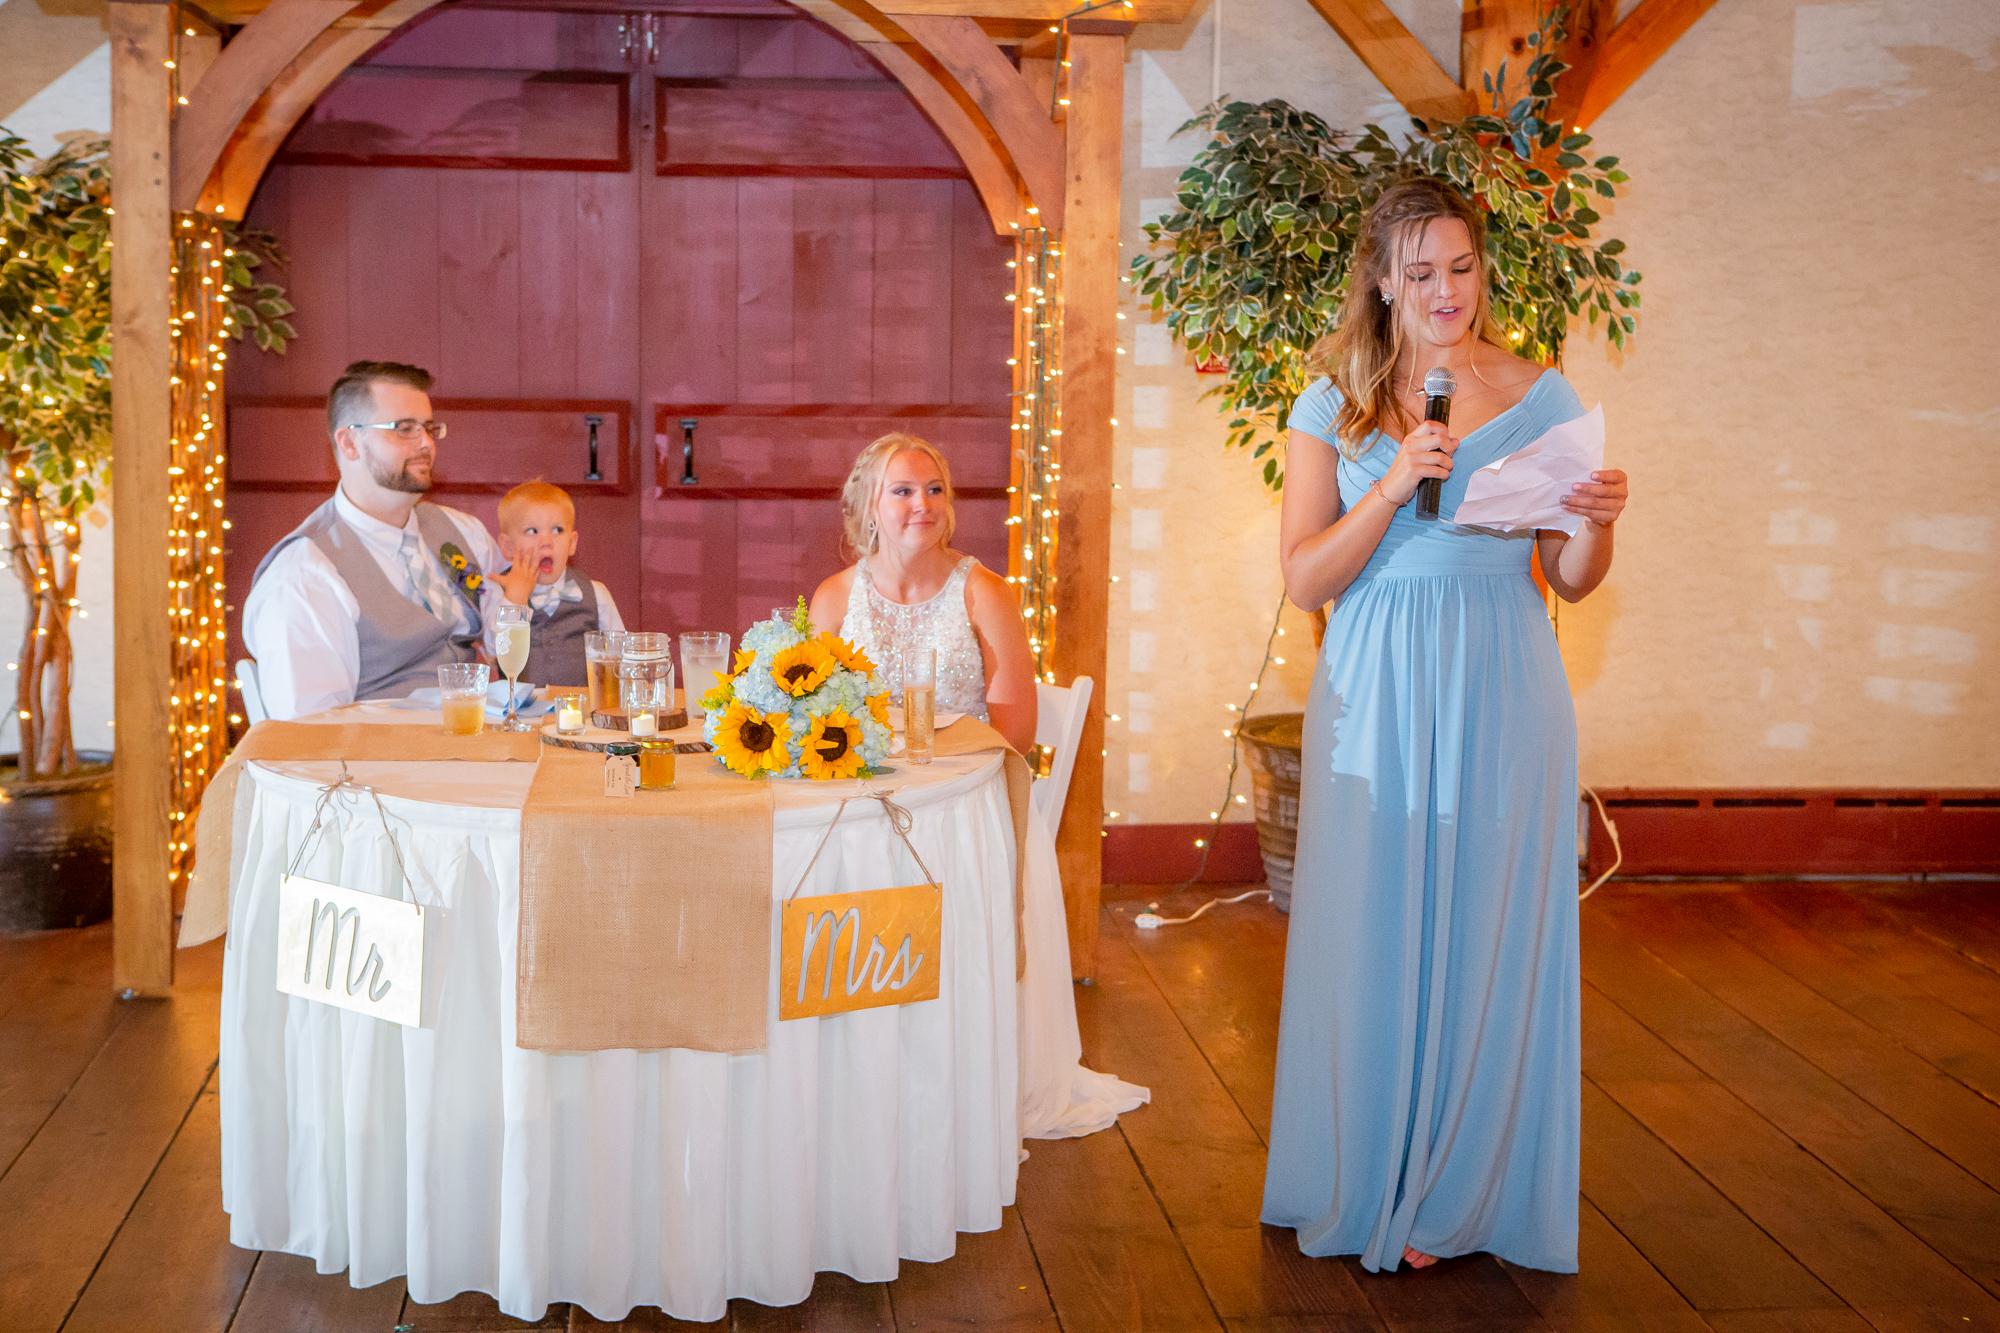 Wedding-Carriage-House-Oneonta-NY-0933.jpg